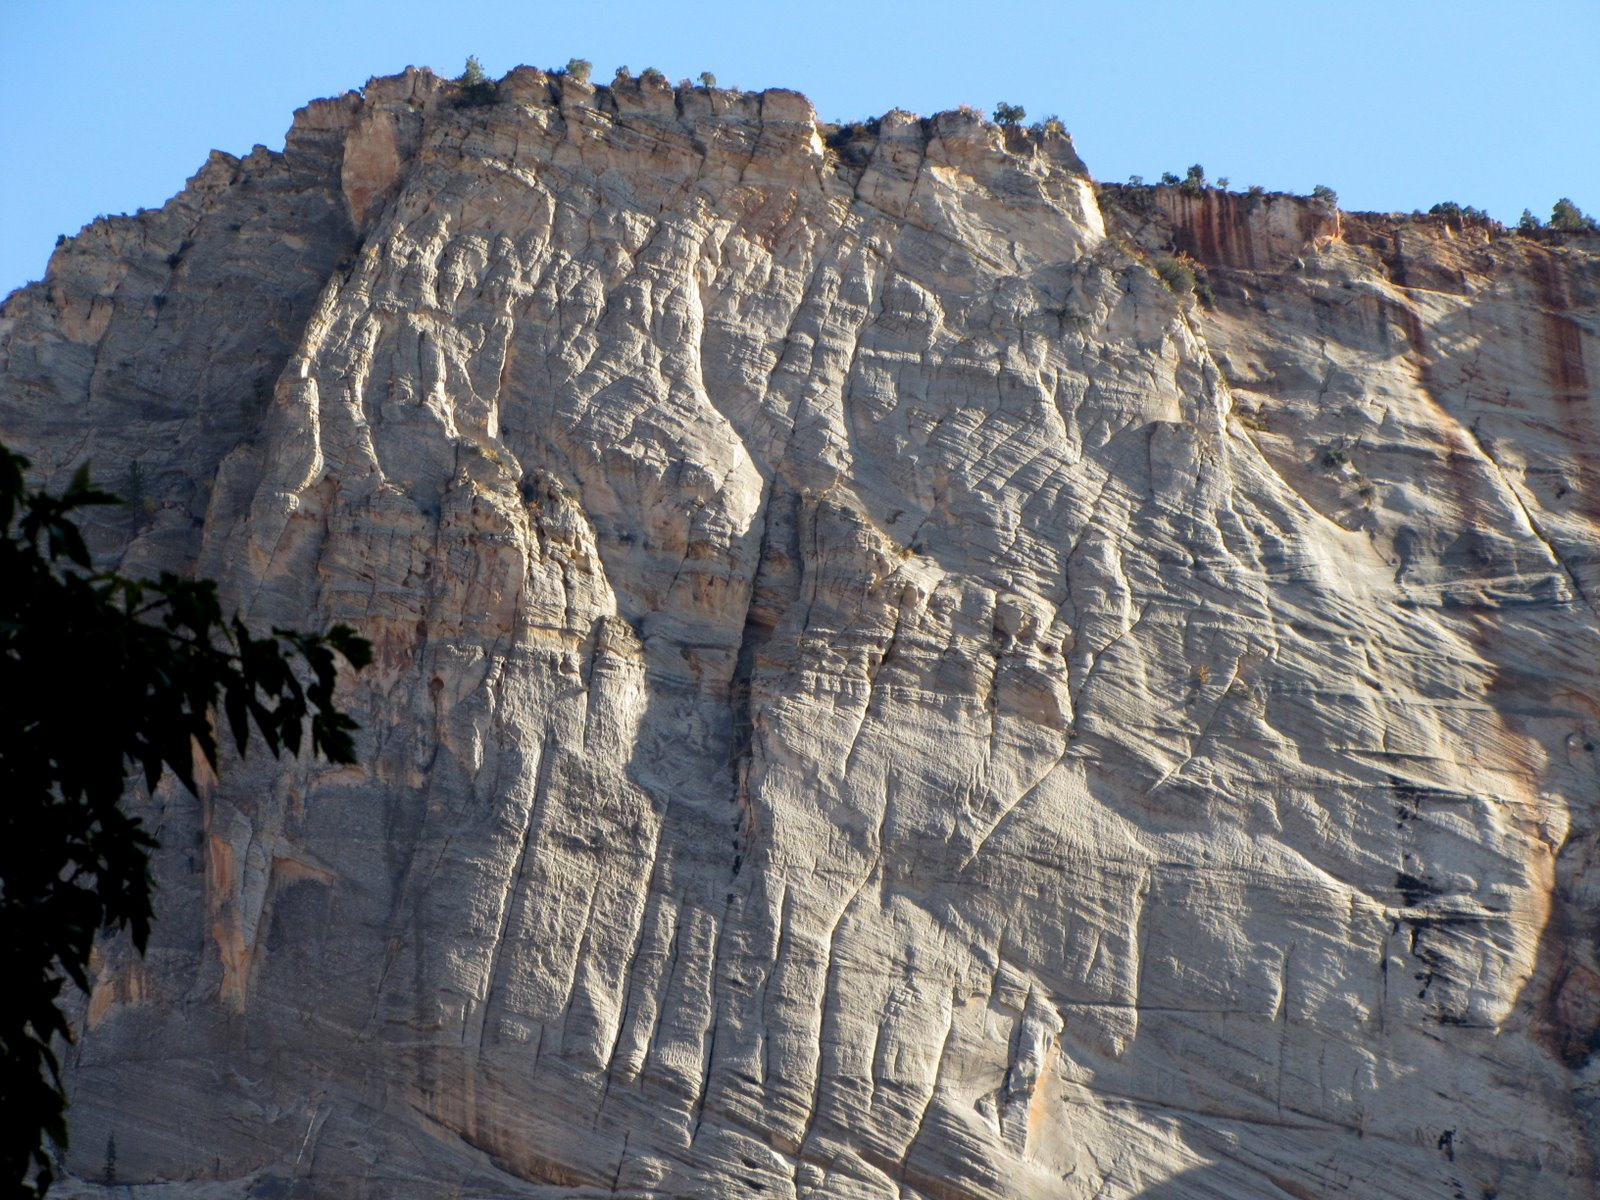 Fehér elefántbőr szikla  White elephant-skin rock